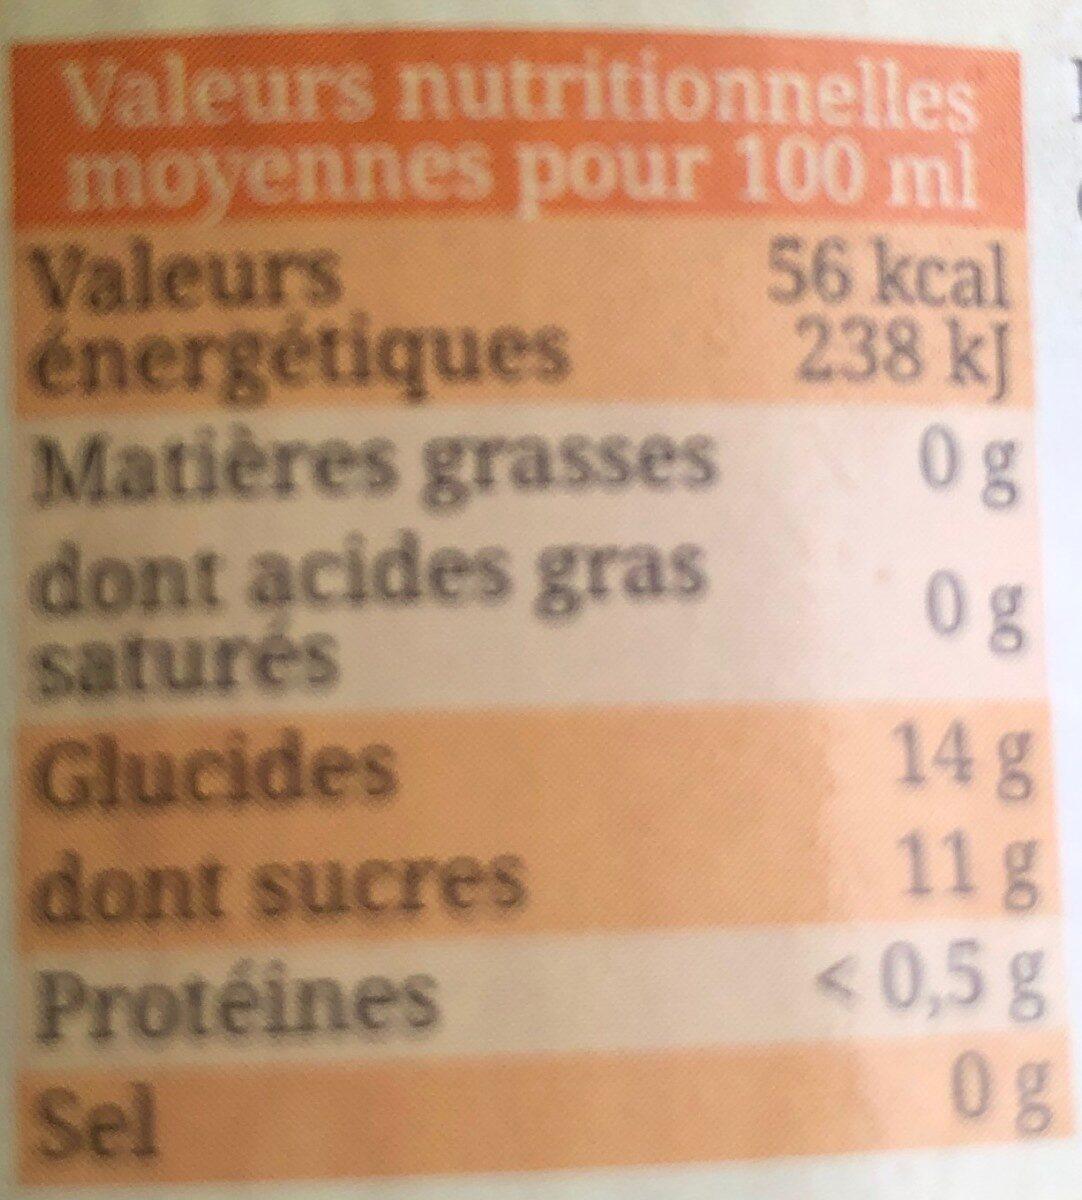 Nectar d'abricot du Pays d'Oc - Valori nutrizionali - fr